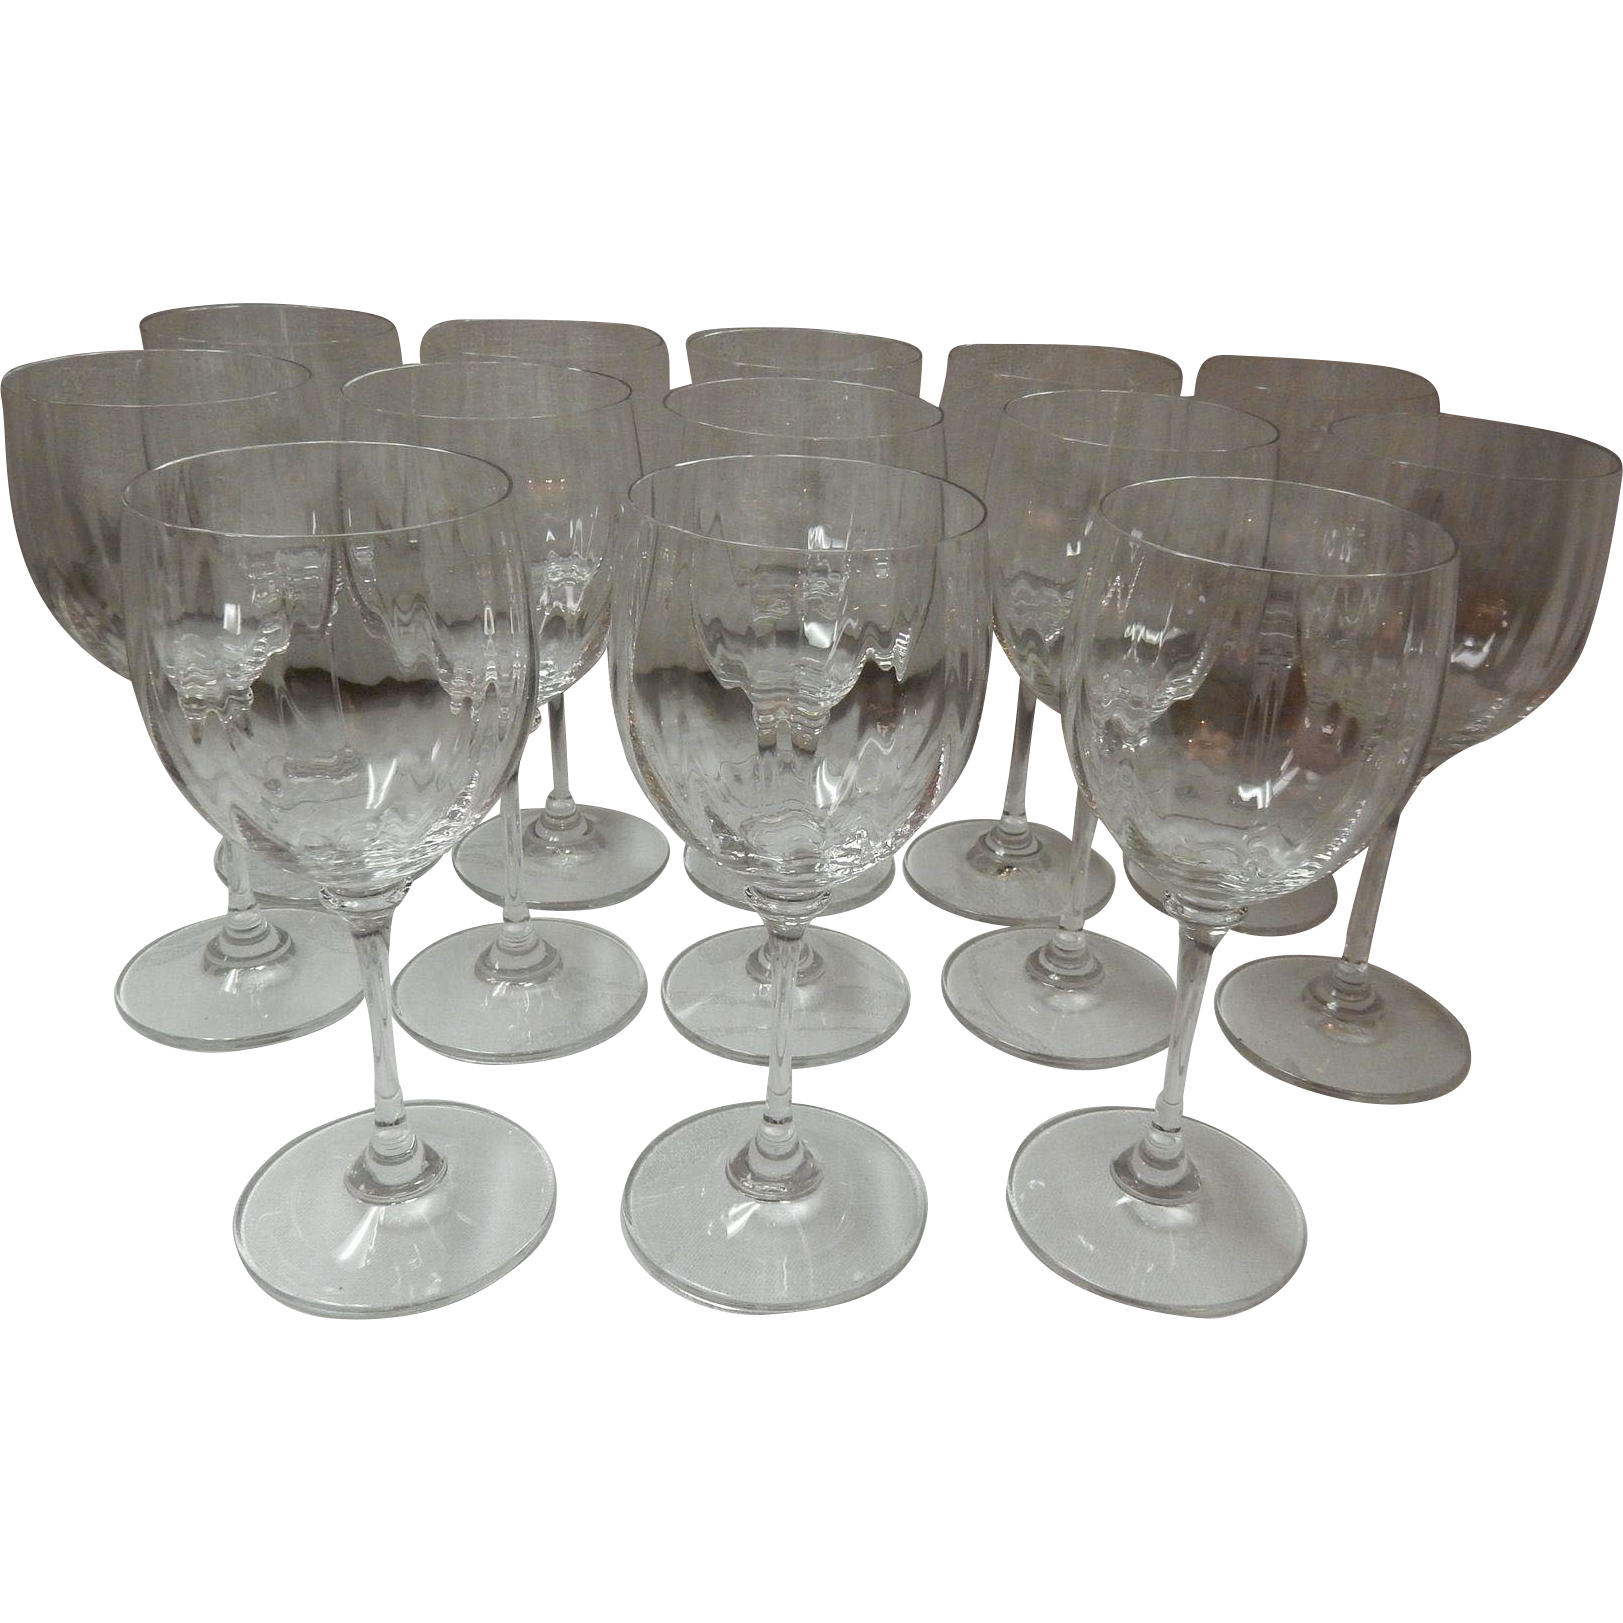 Set Of 13 Crystal Wine Glasses